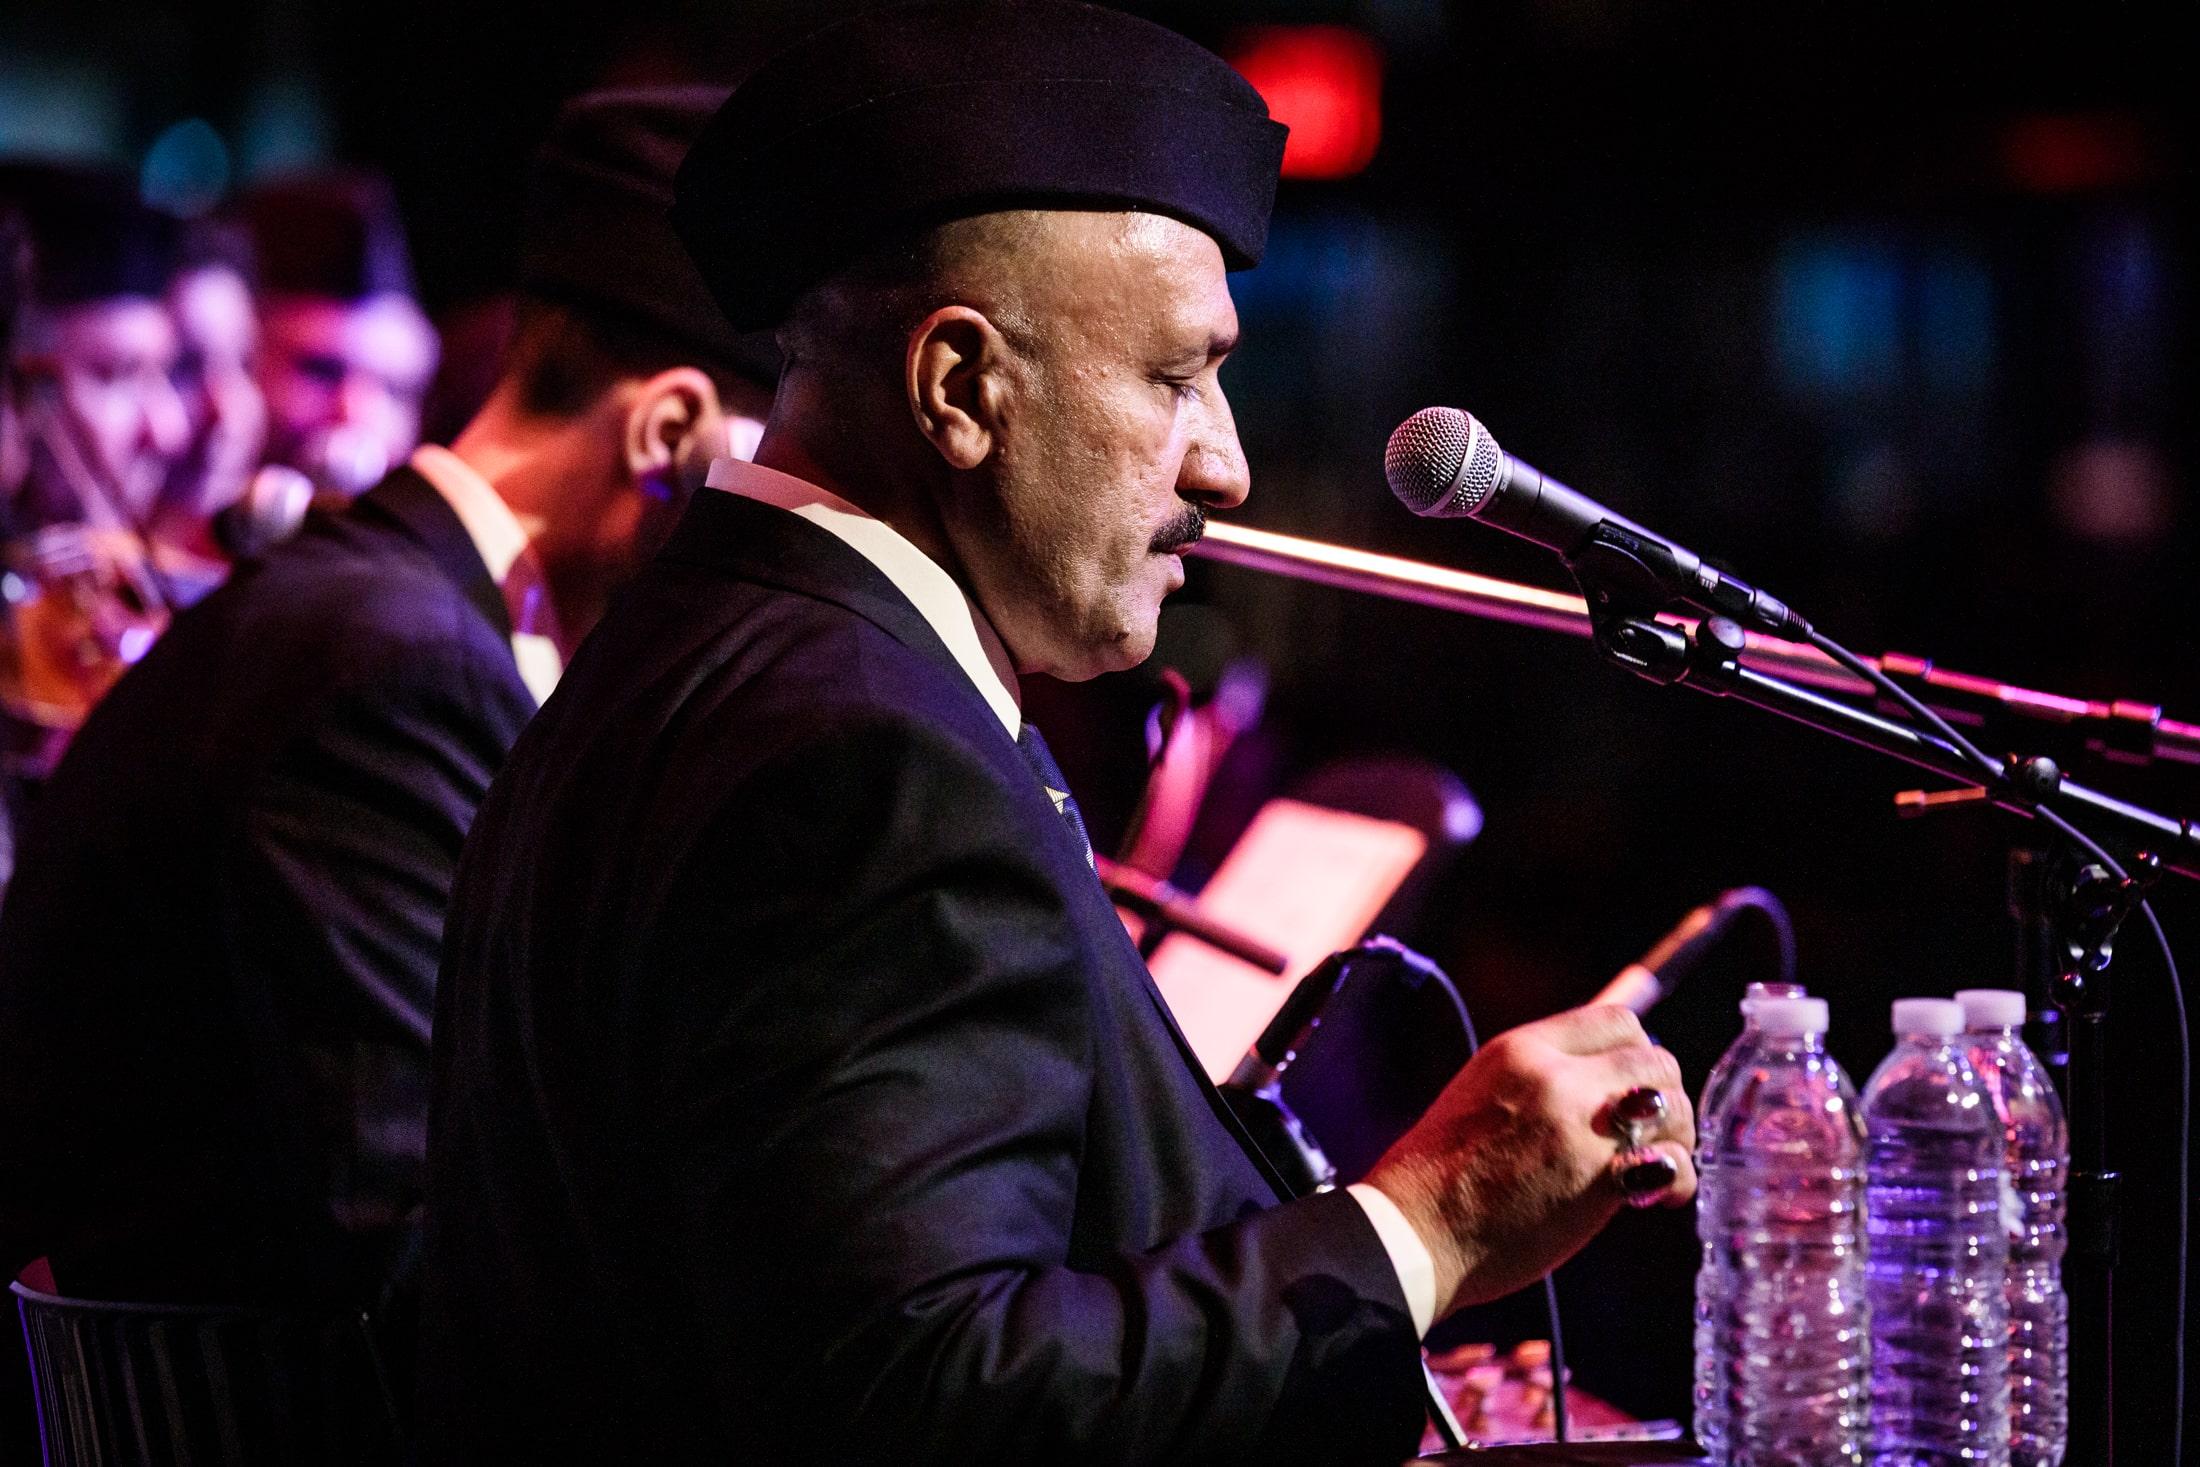 Hamid Al Saadi and Safaafir perform at Lincoln Center, March 2019. Photography by Sachyn Mital.